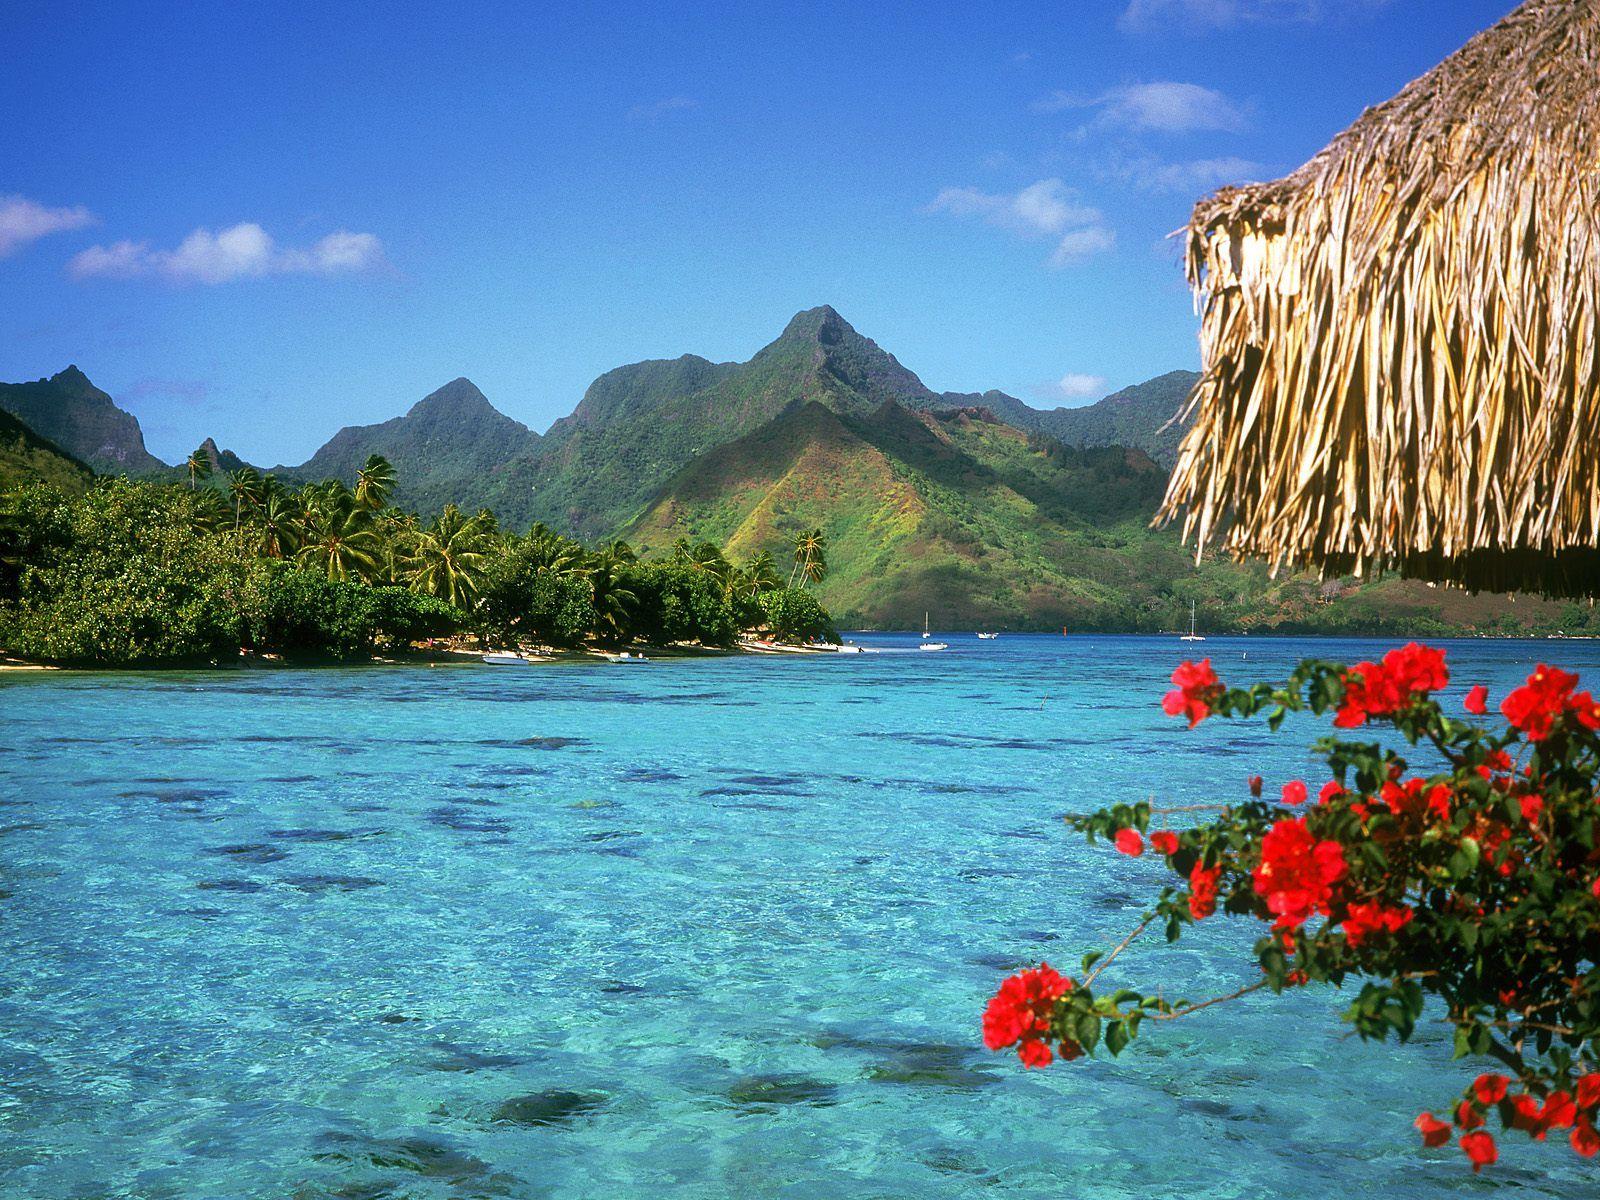 fond d'écran lagon a Bora Bora